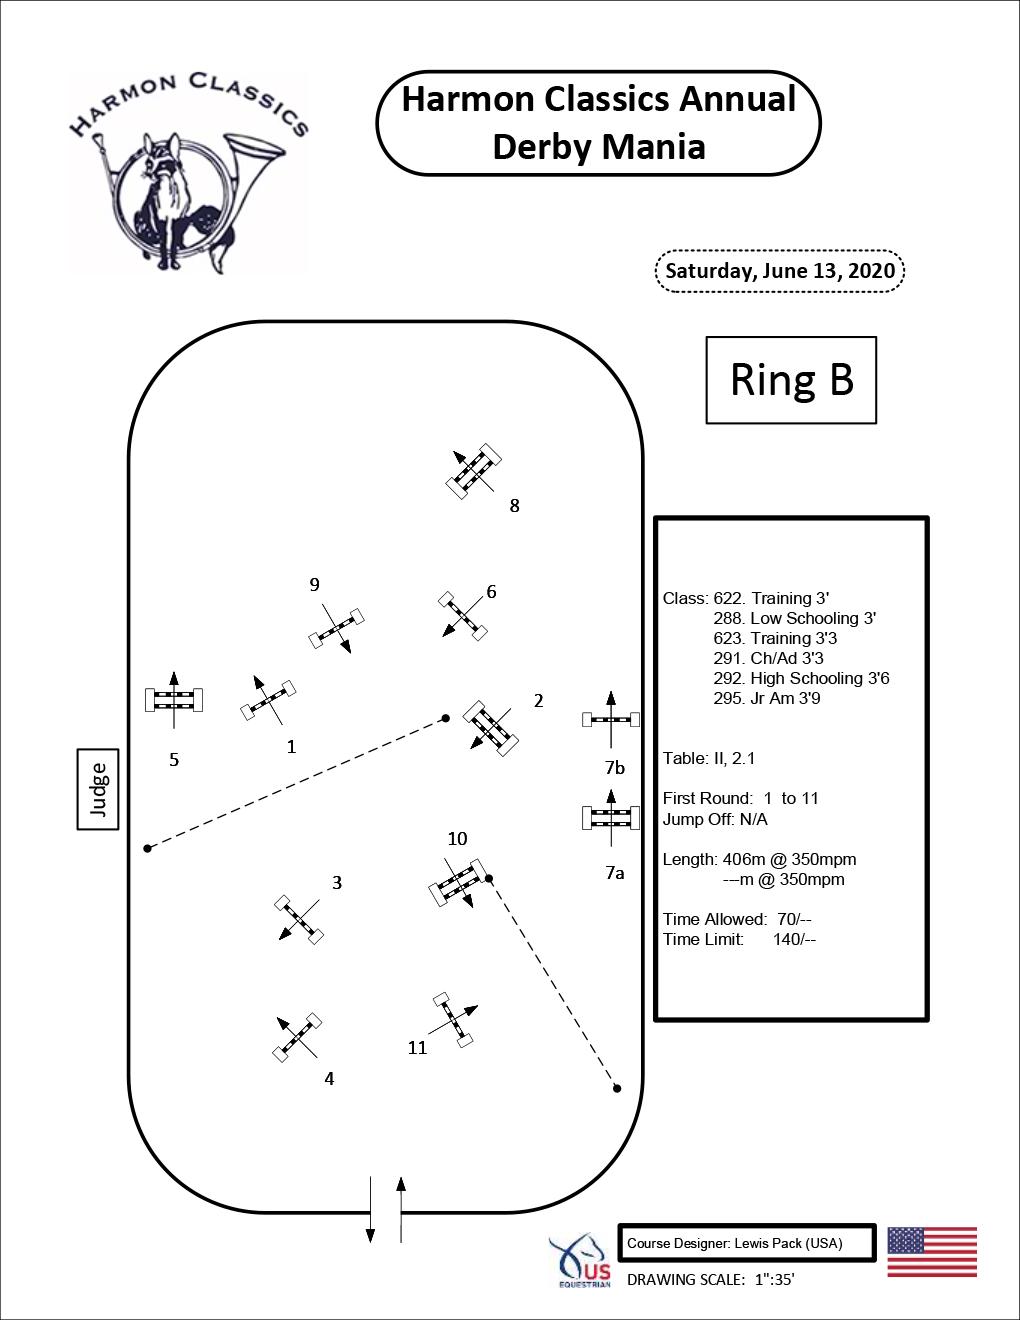 Ring-B-Saturday6-13-Table-II-1-3-3'3-3'6-3'9-Harmon-Classics-Derby-Mania